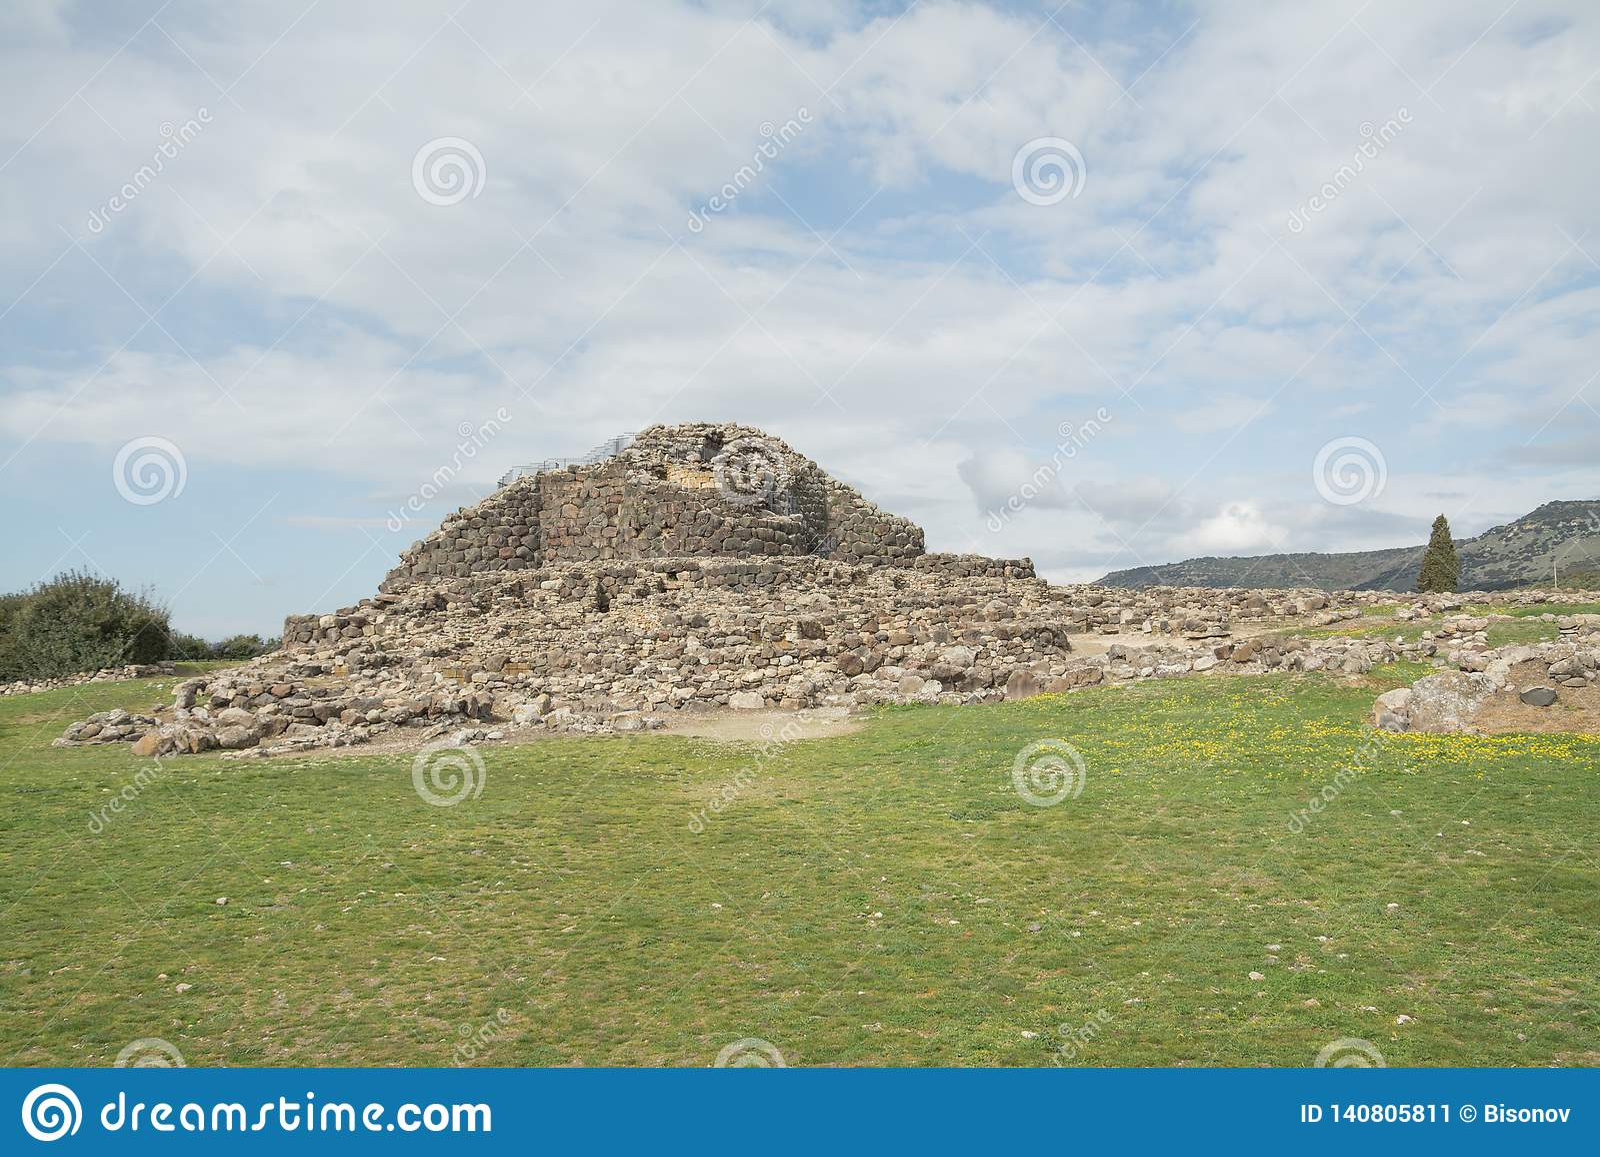 BARUMINI, Sardinige, Italië - Februari 23, 2019: De ruïnes van Su Nuraxi dichtbij Barumini in Sardinige